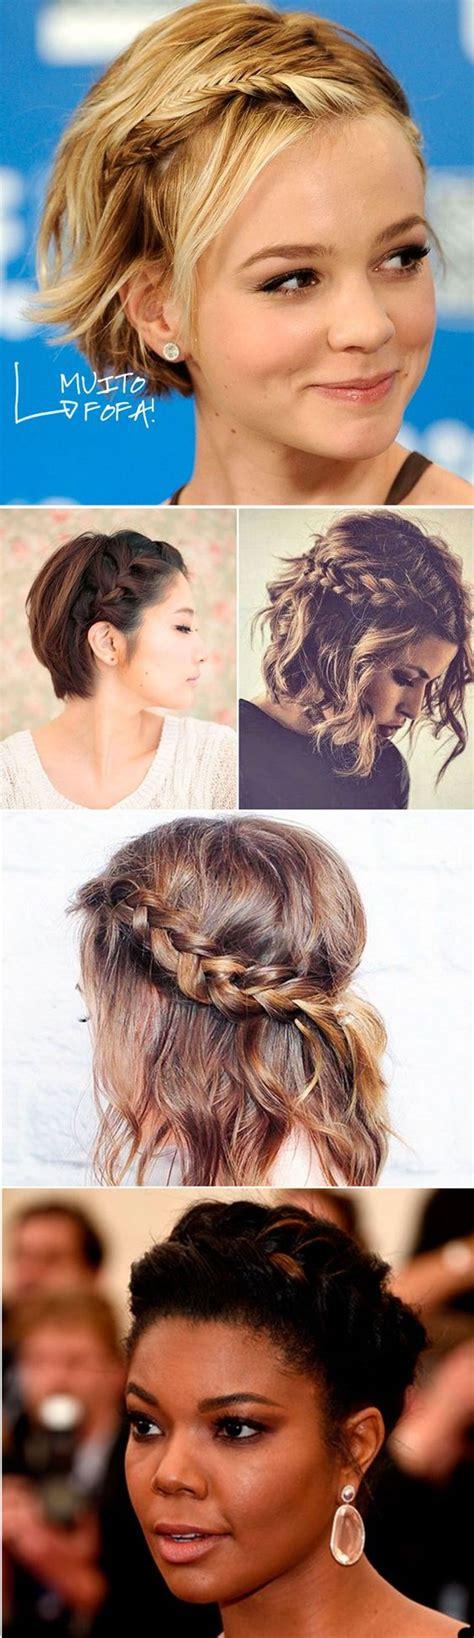 penteados  cabelos curtos faceis simples  modernos